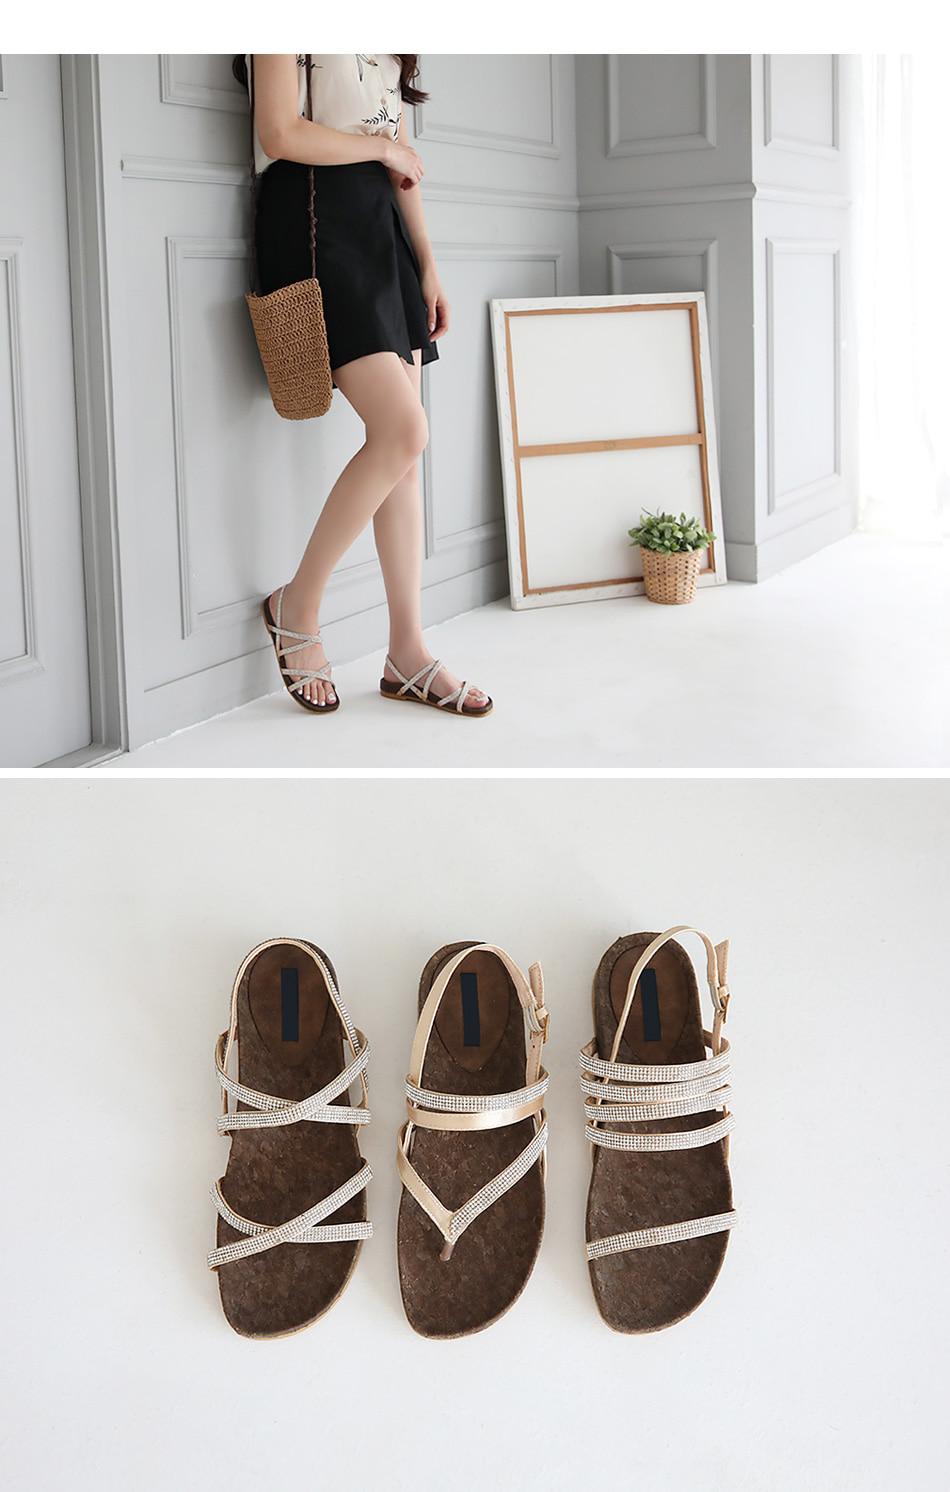 Ilian sling back sandals 2cm